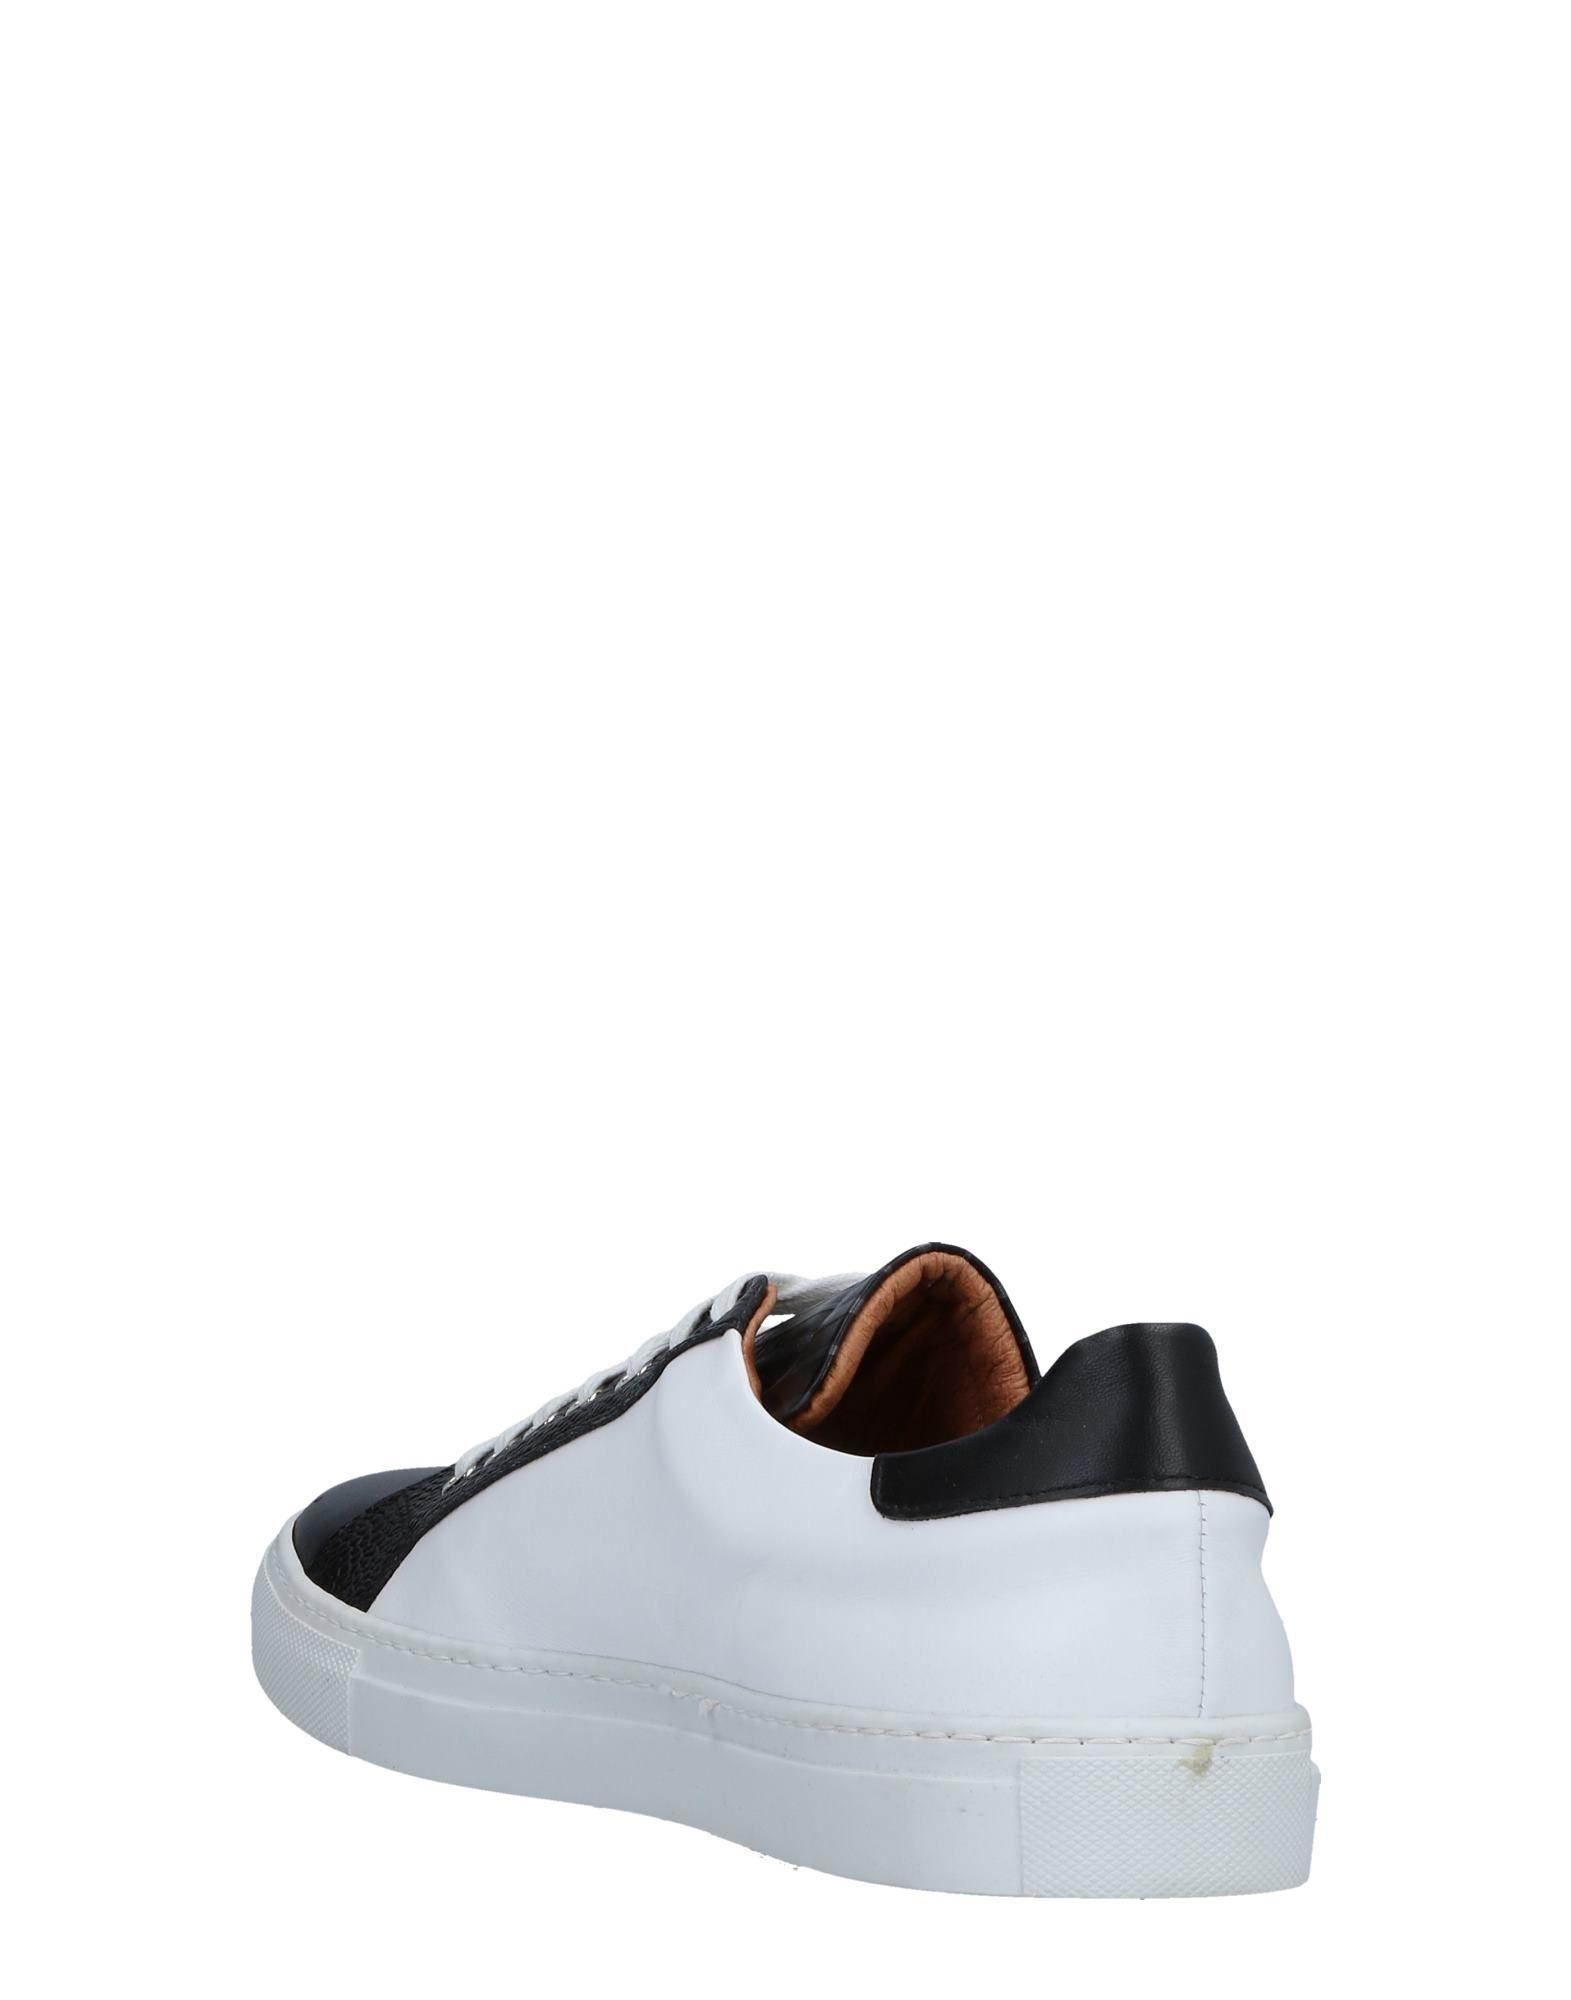 Ebarrito Sneakers Schuhe Herren  11521232JK Heiße Schuhe Sneakers 26b7d4